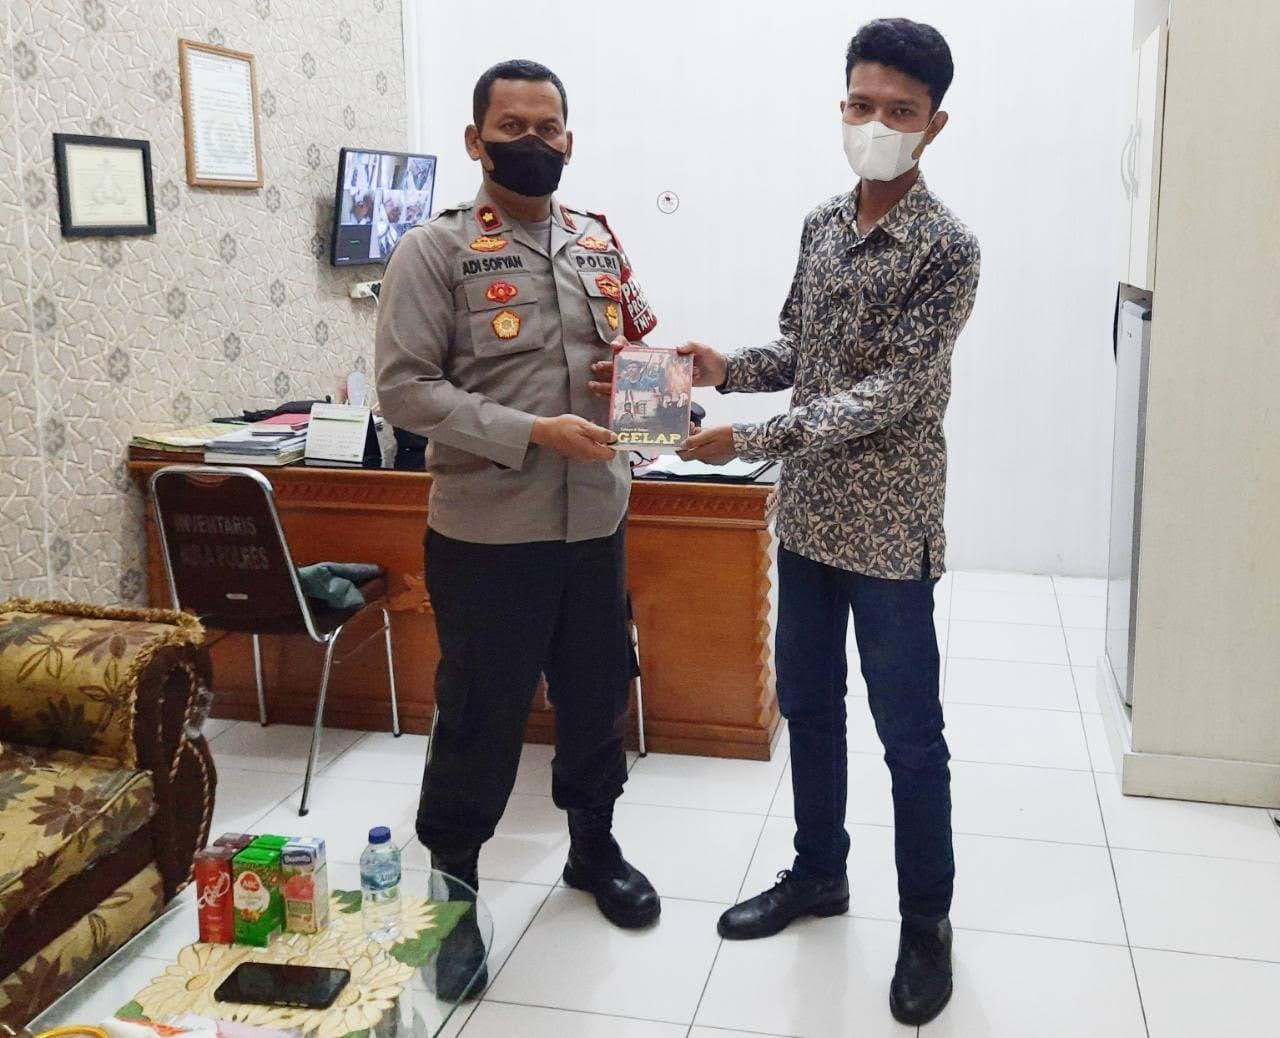 Marak Provokator dan Hoax, Pemuda Aceh Sambangi Polres Aceh Barat